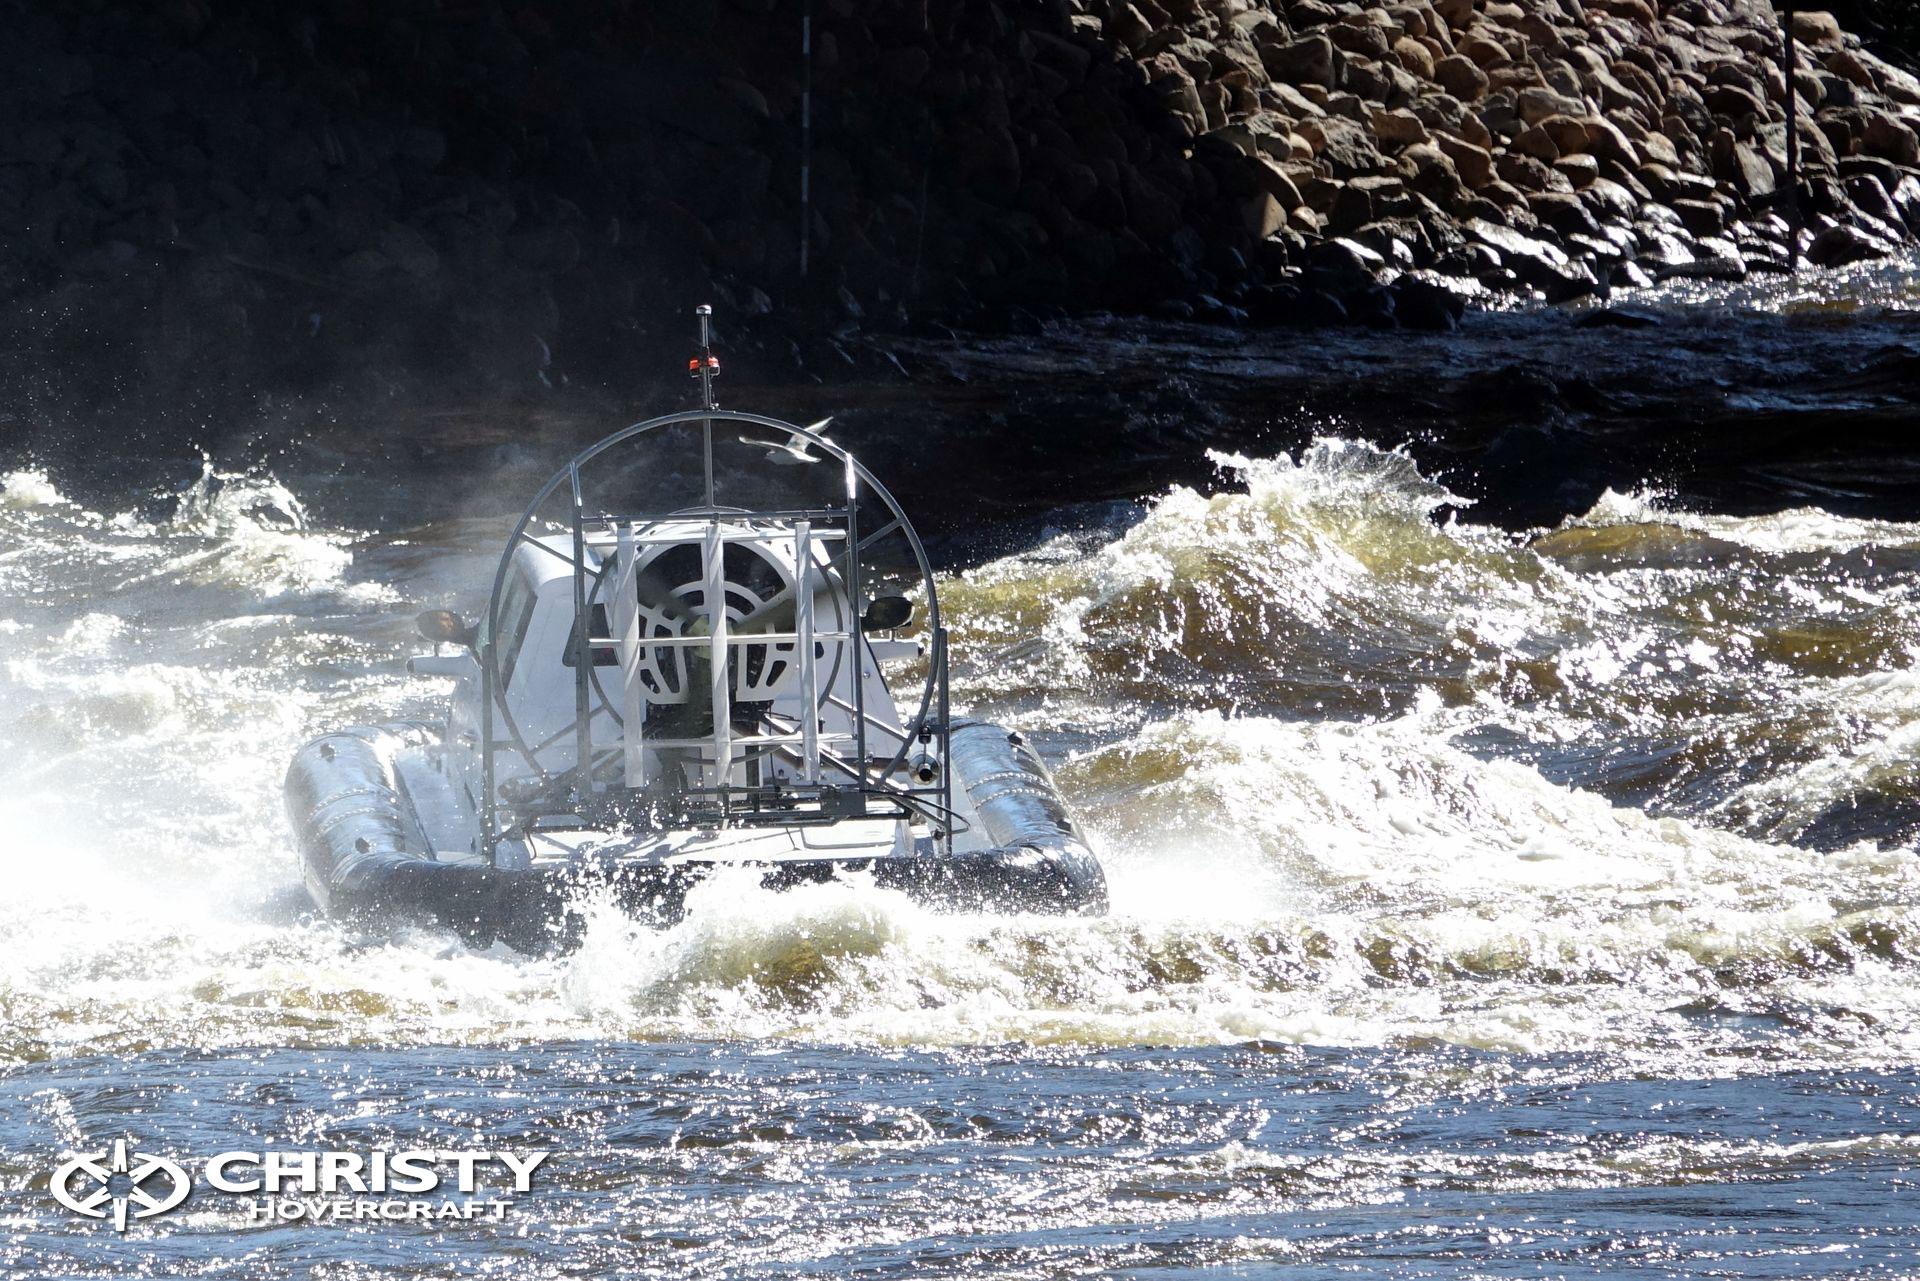 Hovercraft-Christy-5146-FC-10.jpg | фото №13